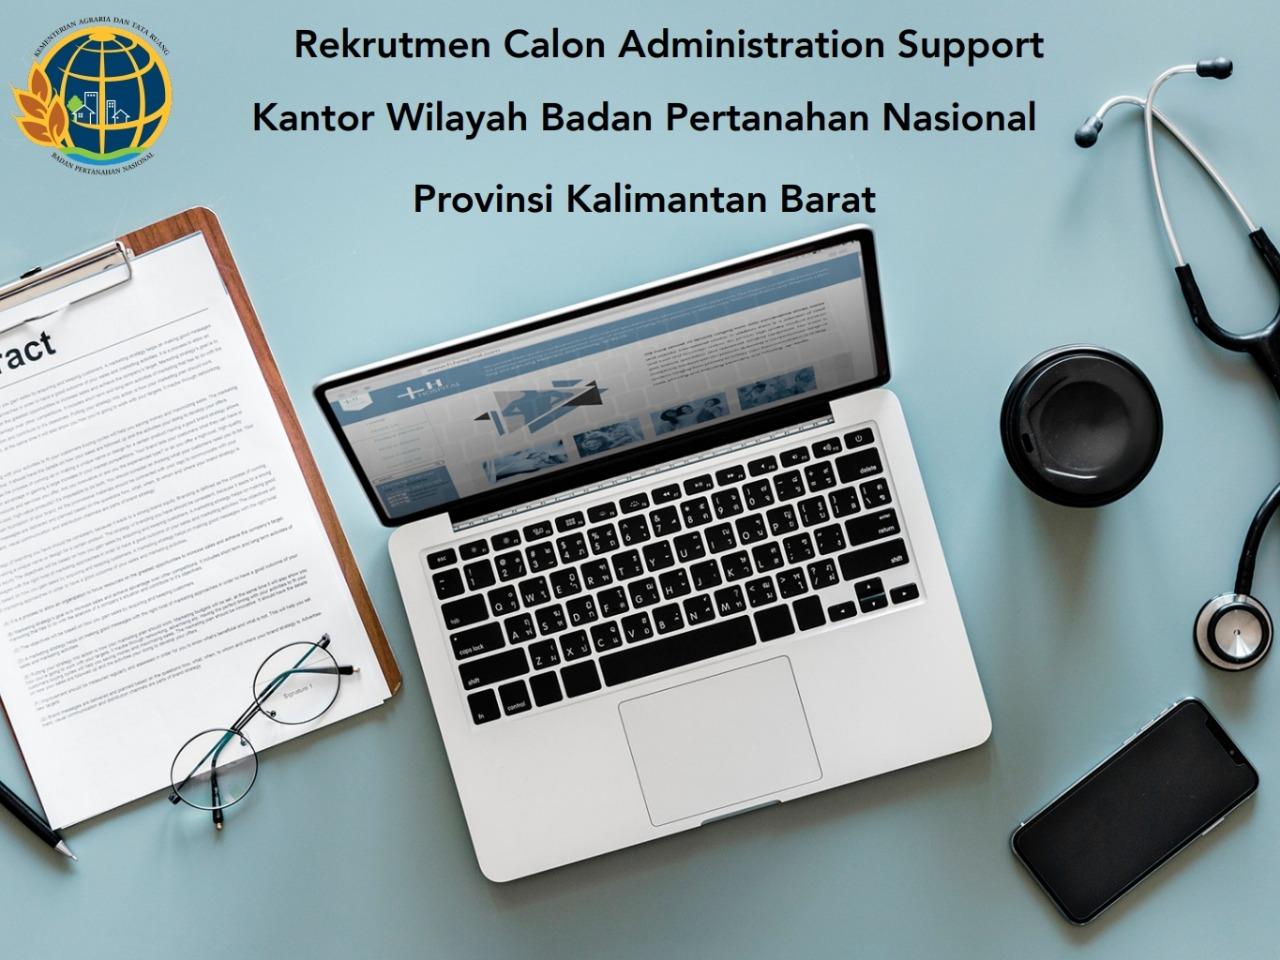 Lowongan Kerja Administration Support Kantor Badan Pertanahan Nasional Juli 2020